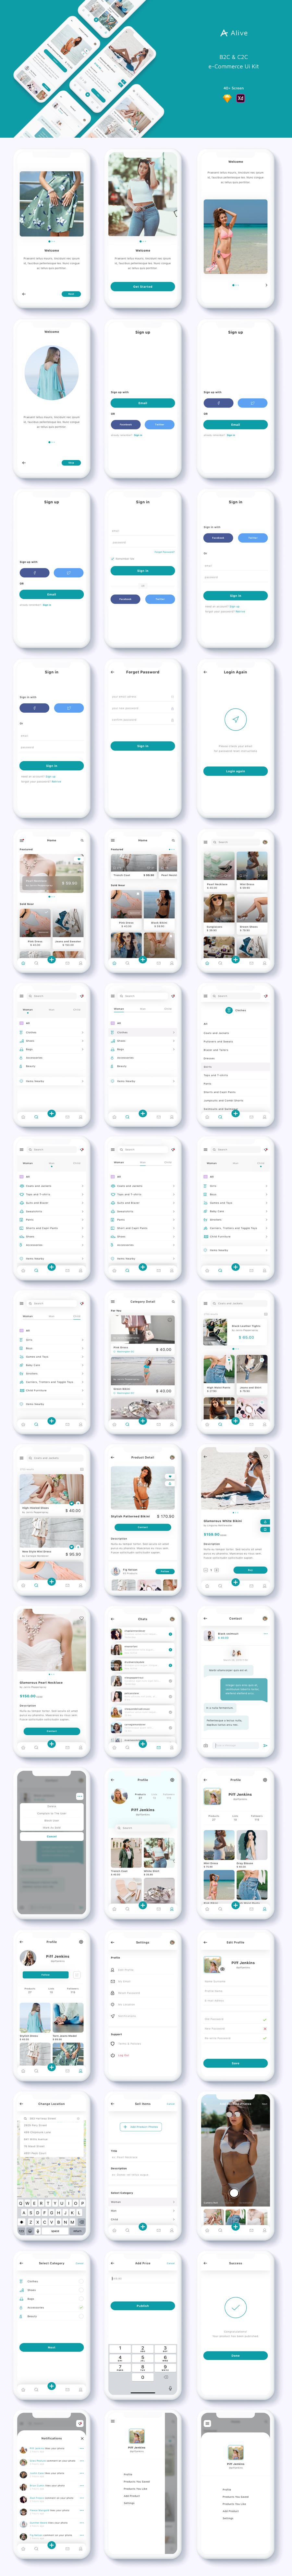 Alive - B2C and C2C eCommerce App Ui Kit - 1